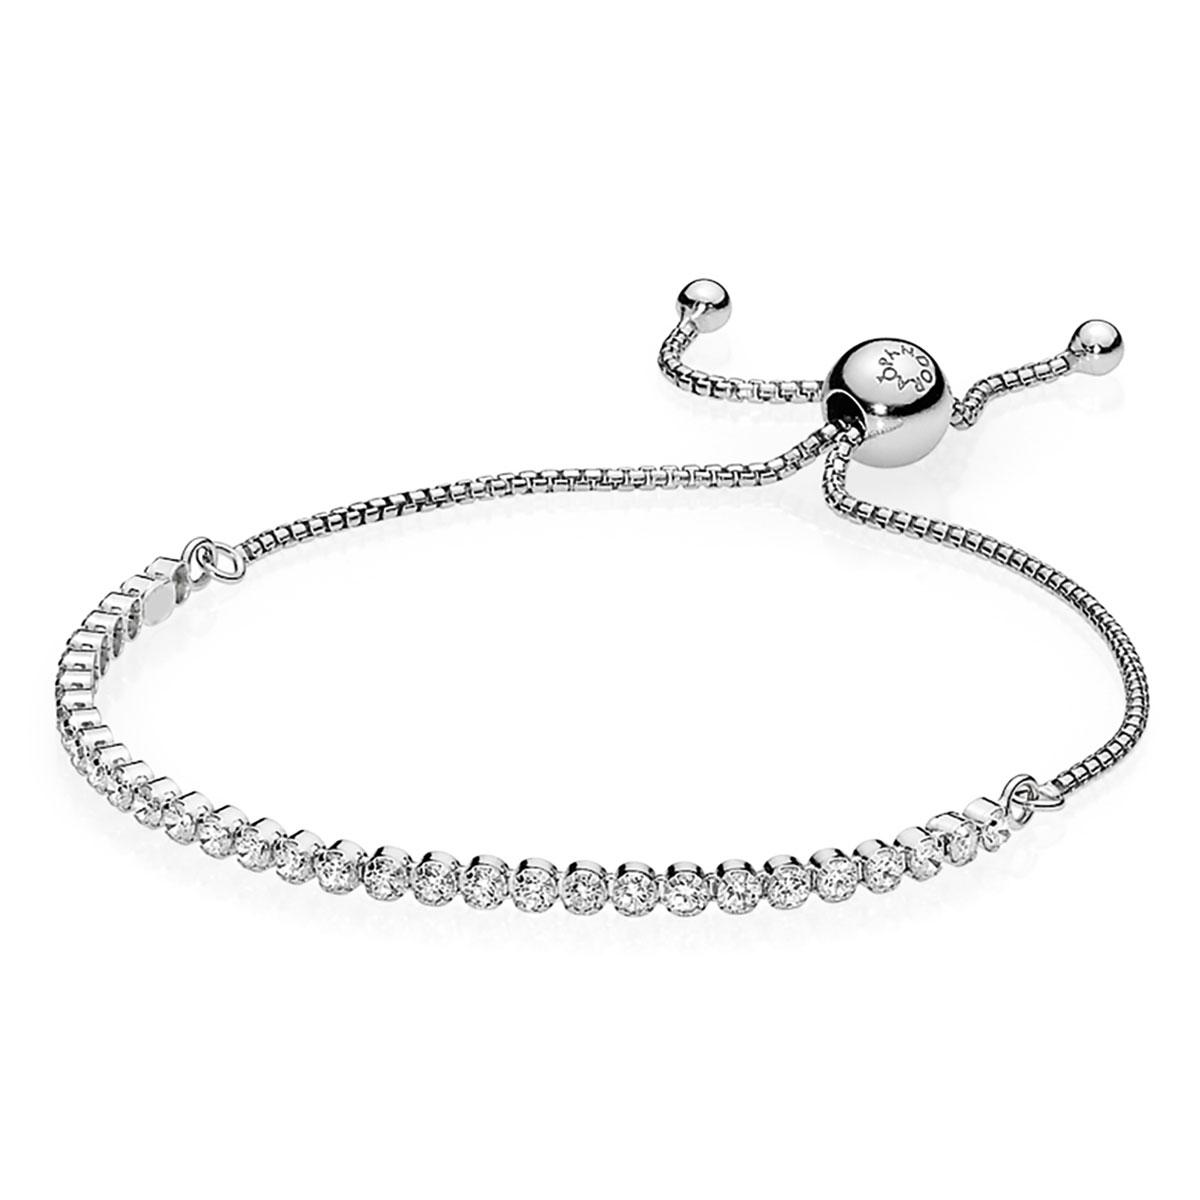 c371a6cc6 Sparkling Strand Bracelet, Clear CZ PANDORA - Pancharmbracelets.com